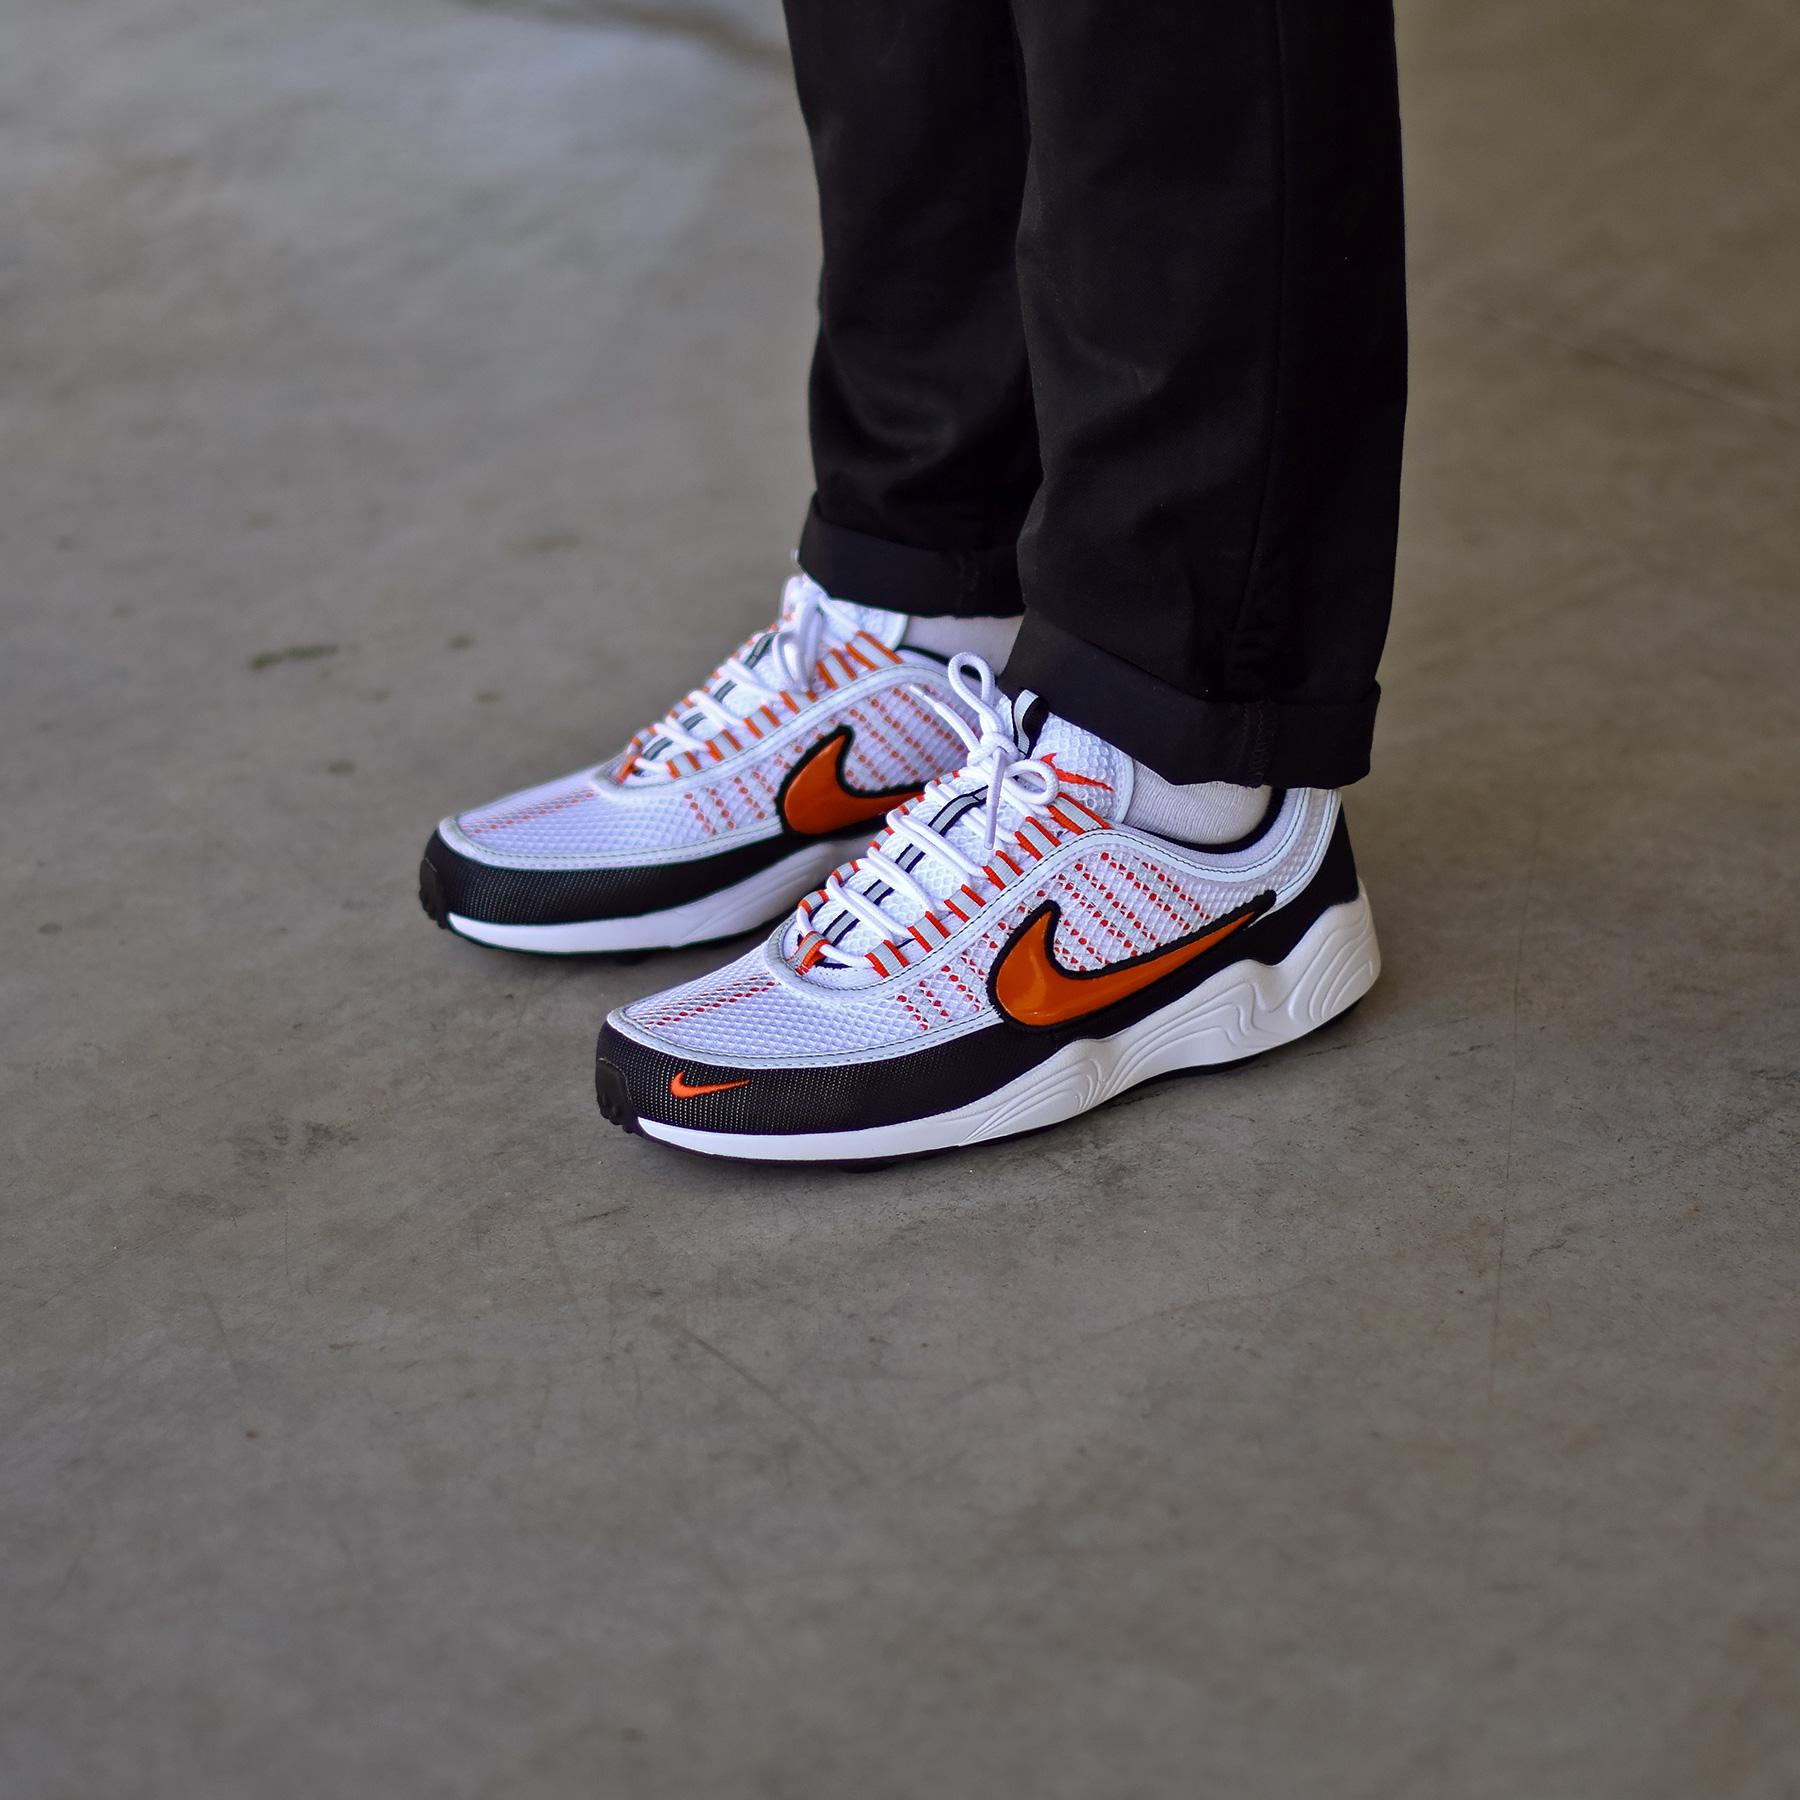 Nike Air Zoom Spiridon White/Team Orange - Sneakers.fr